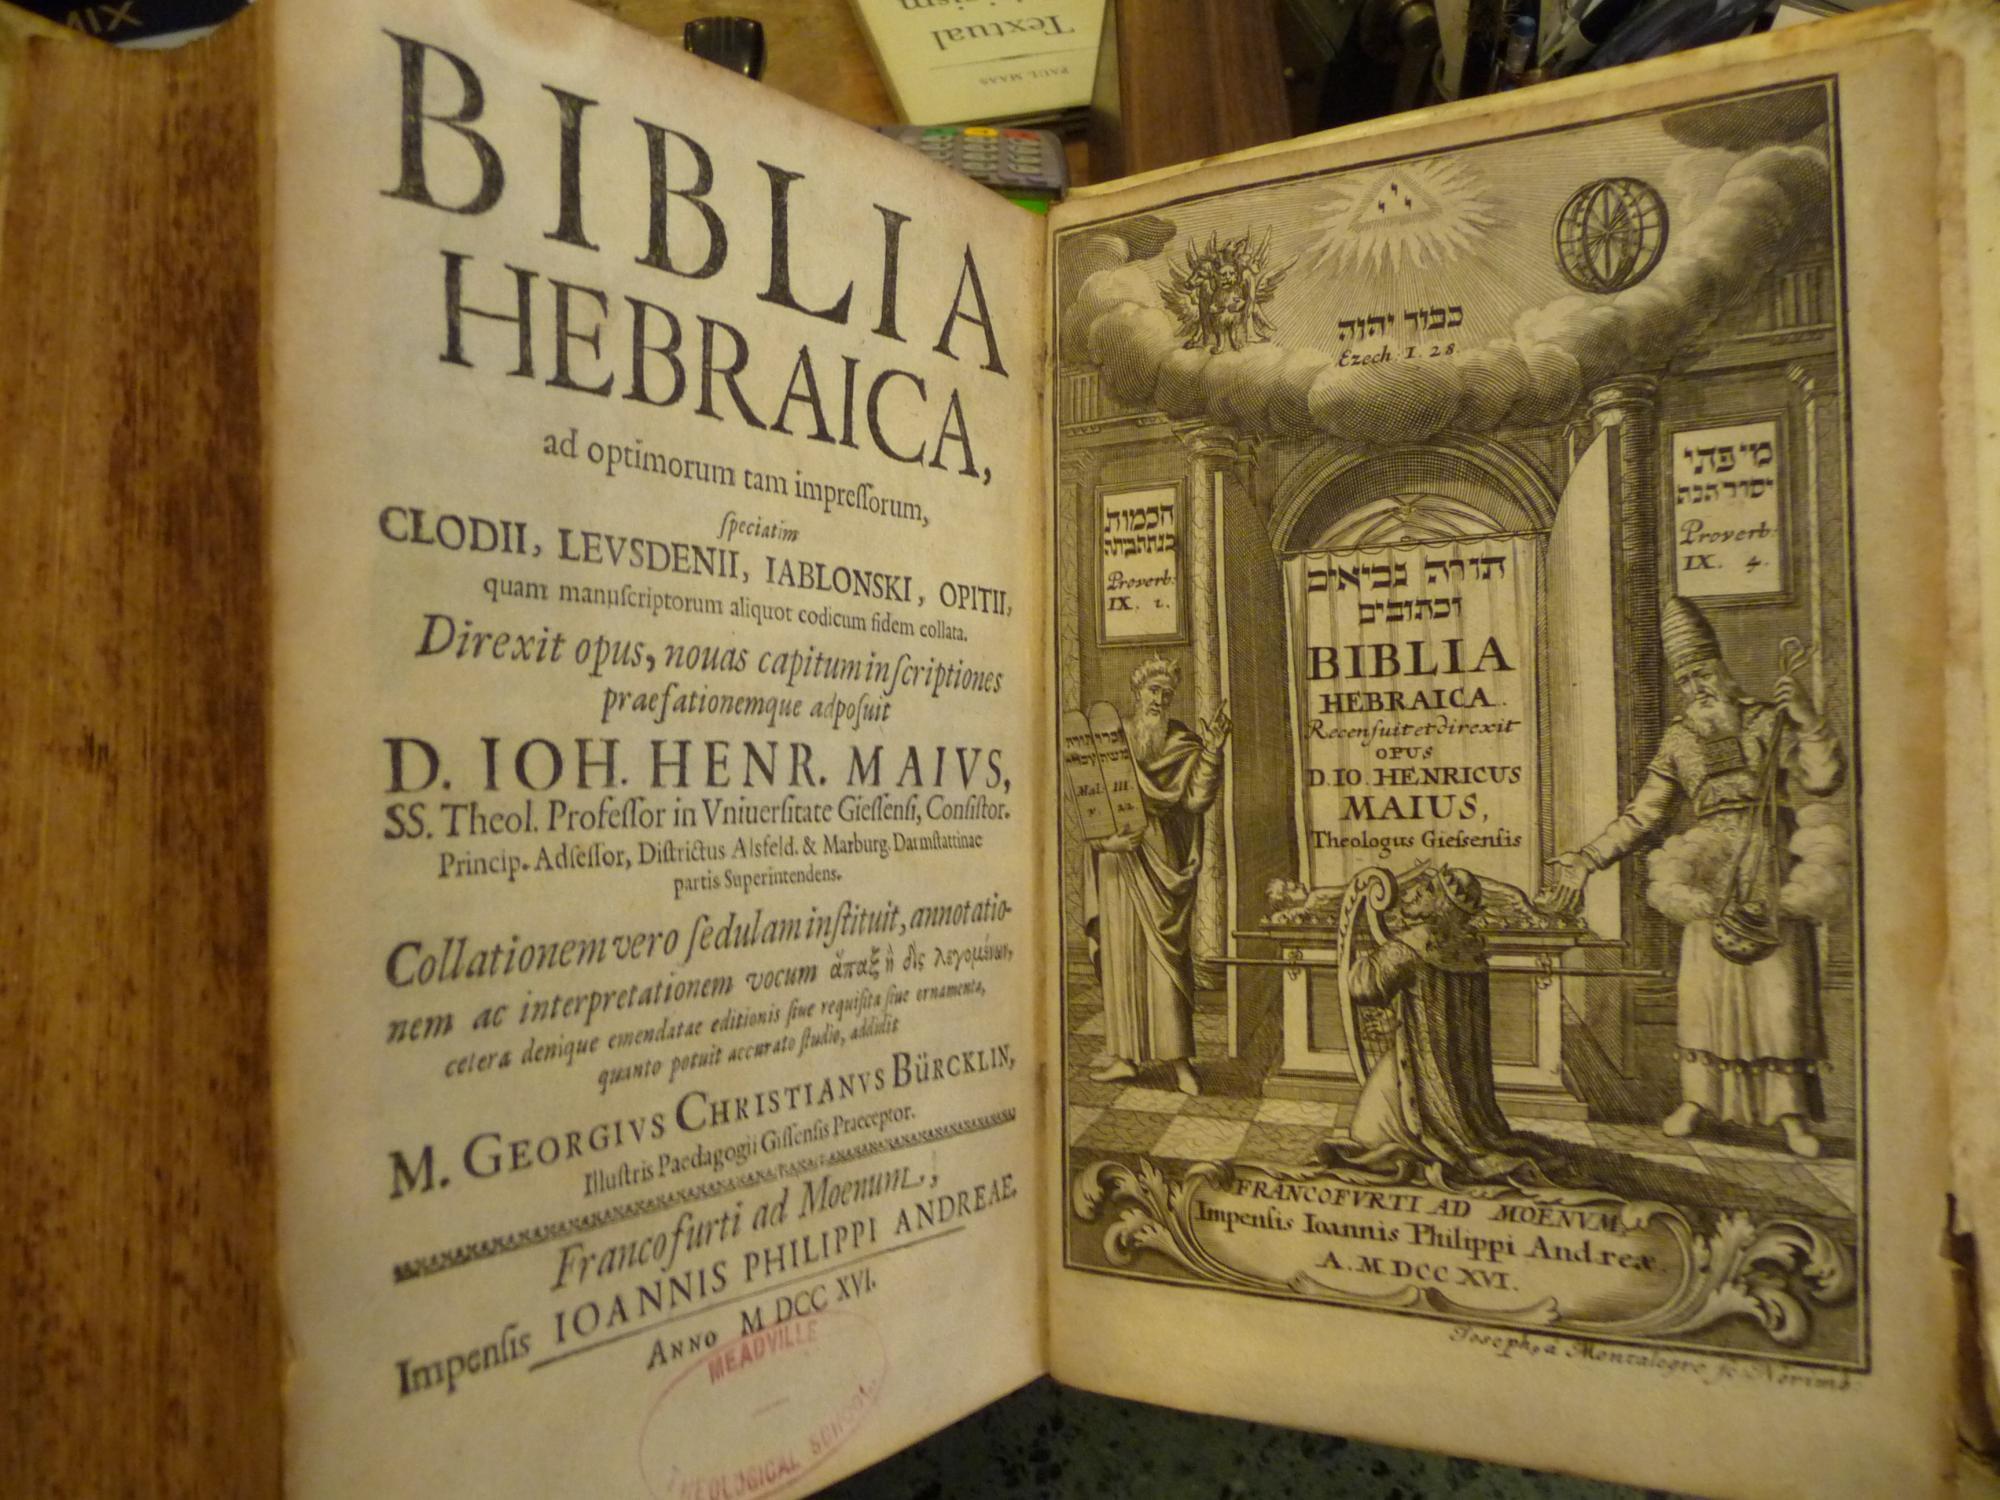 Biblia Hebraica, Ad Optimorum Tam impressorum, Speciatim Clodii, Levsdenii, Iablonski, Opitii, Quam...